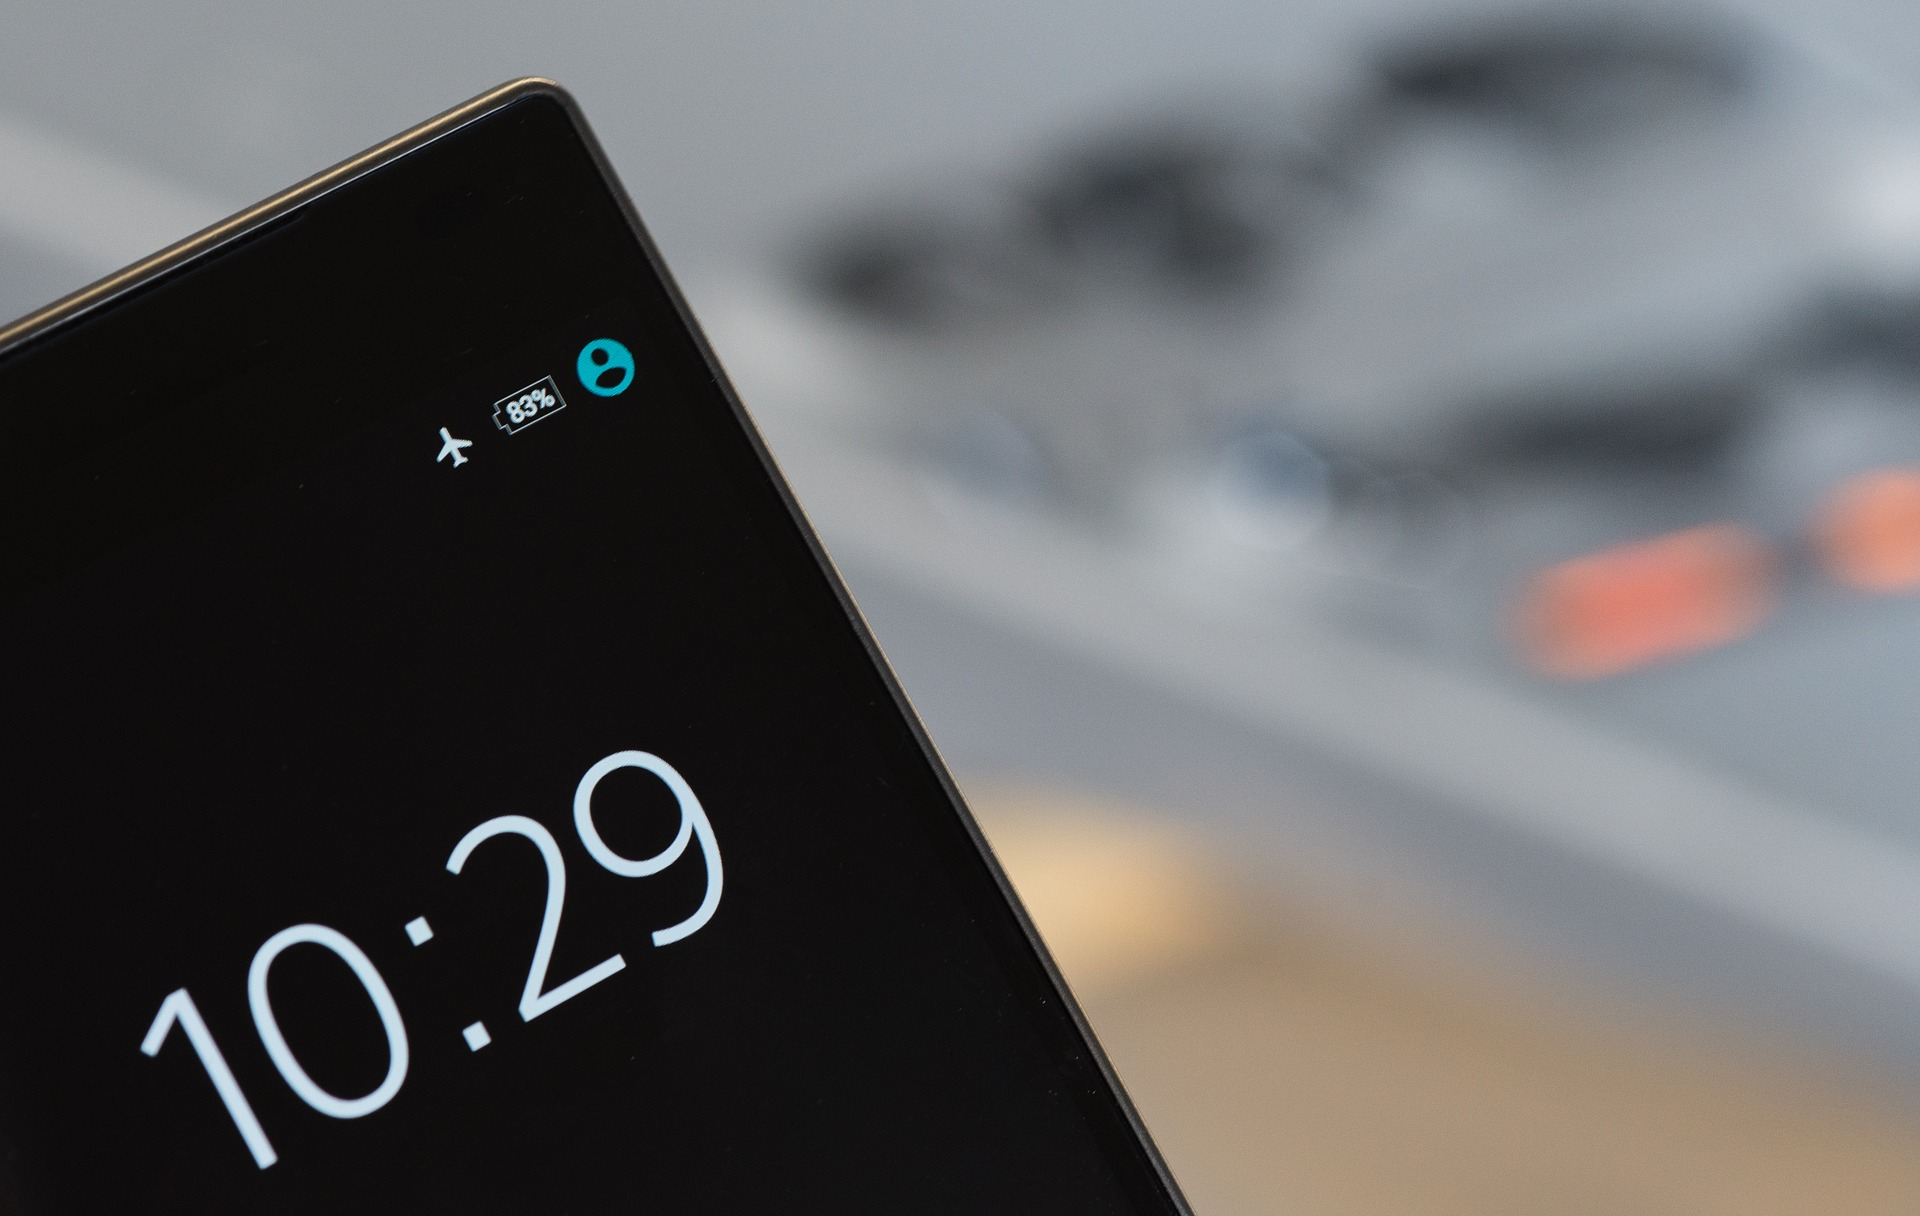 Phone on Flight mode